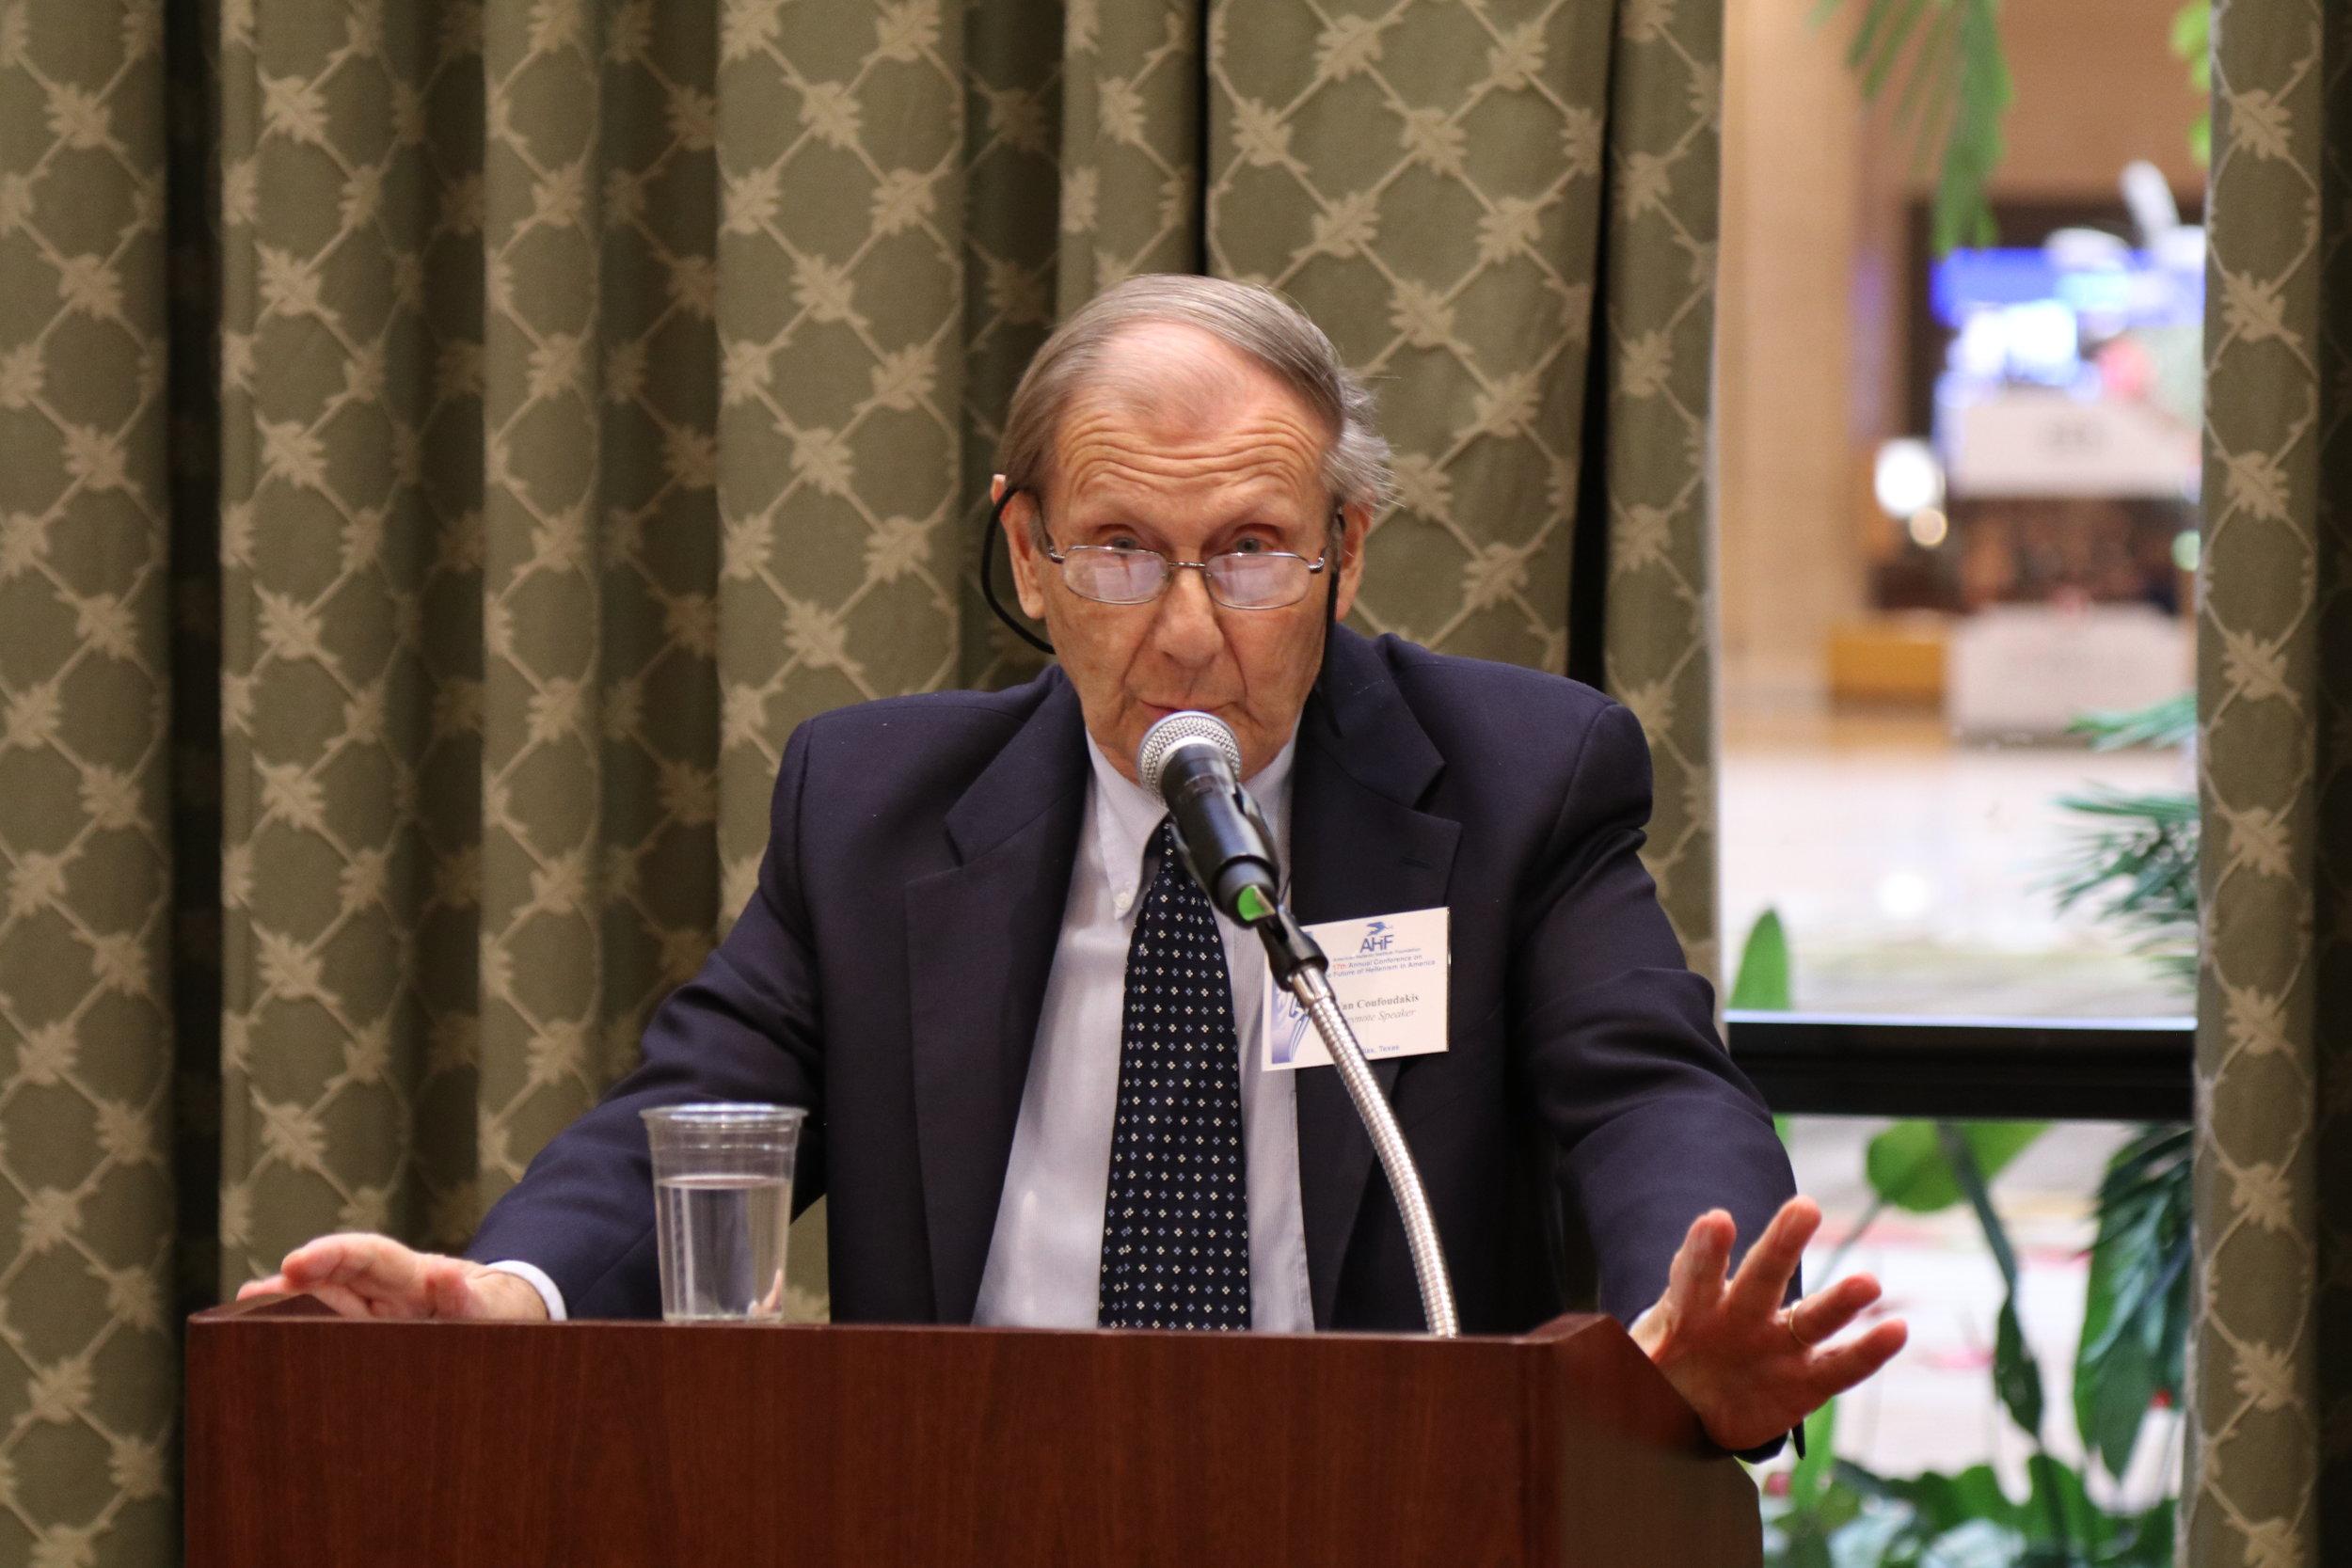 Professor Van Coufoudakis provides the Luncheon Keynote Address.